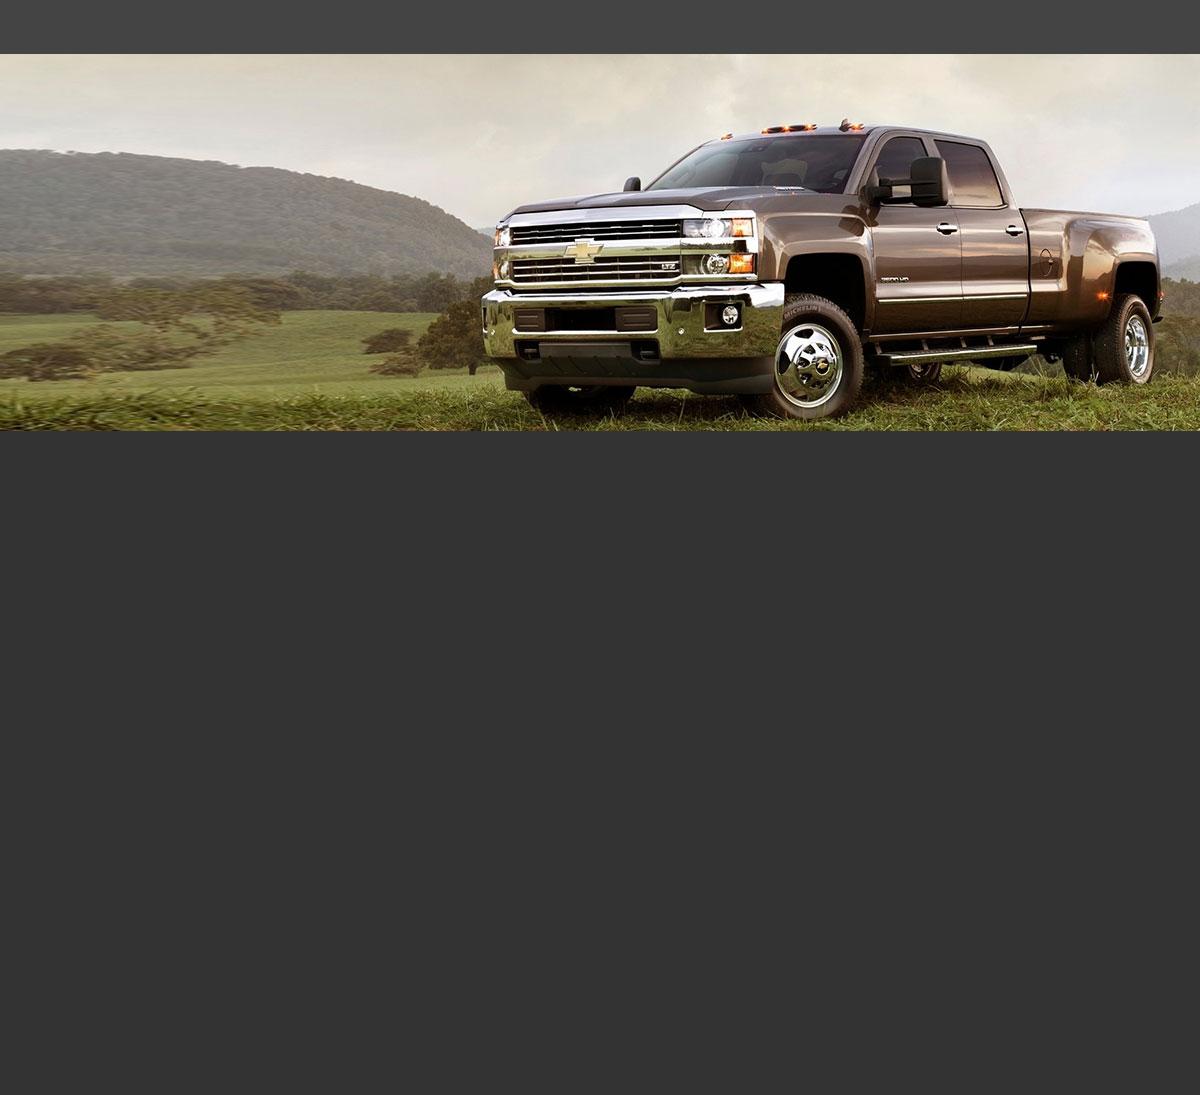 Jeep Grand Cherokee For Sale Near Me: Diesel Trucks Near Me